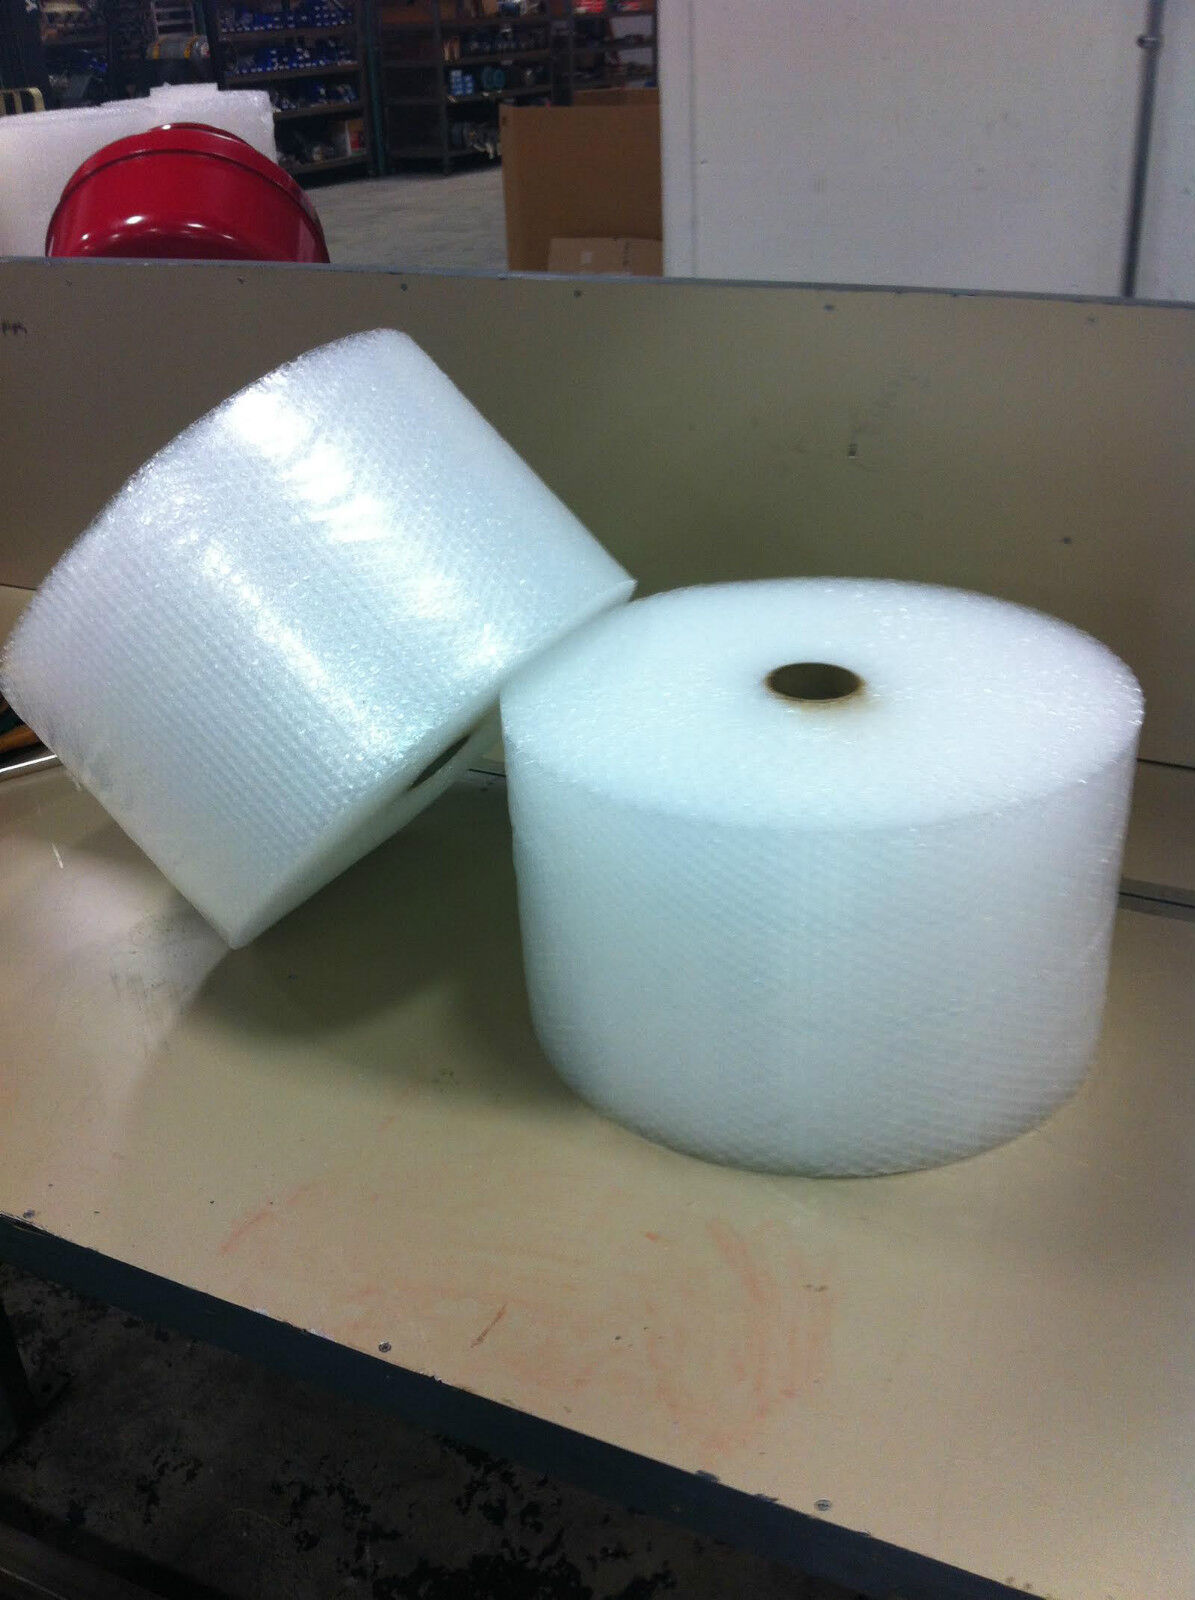 WP 316 x 12 Small Bubble Perf 12 350 ft bubble cushioning wrap padding roll